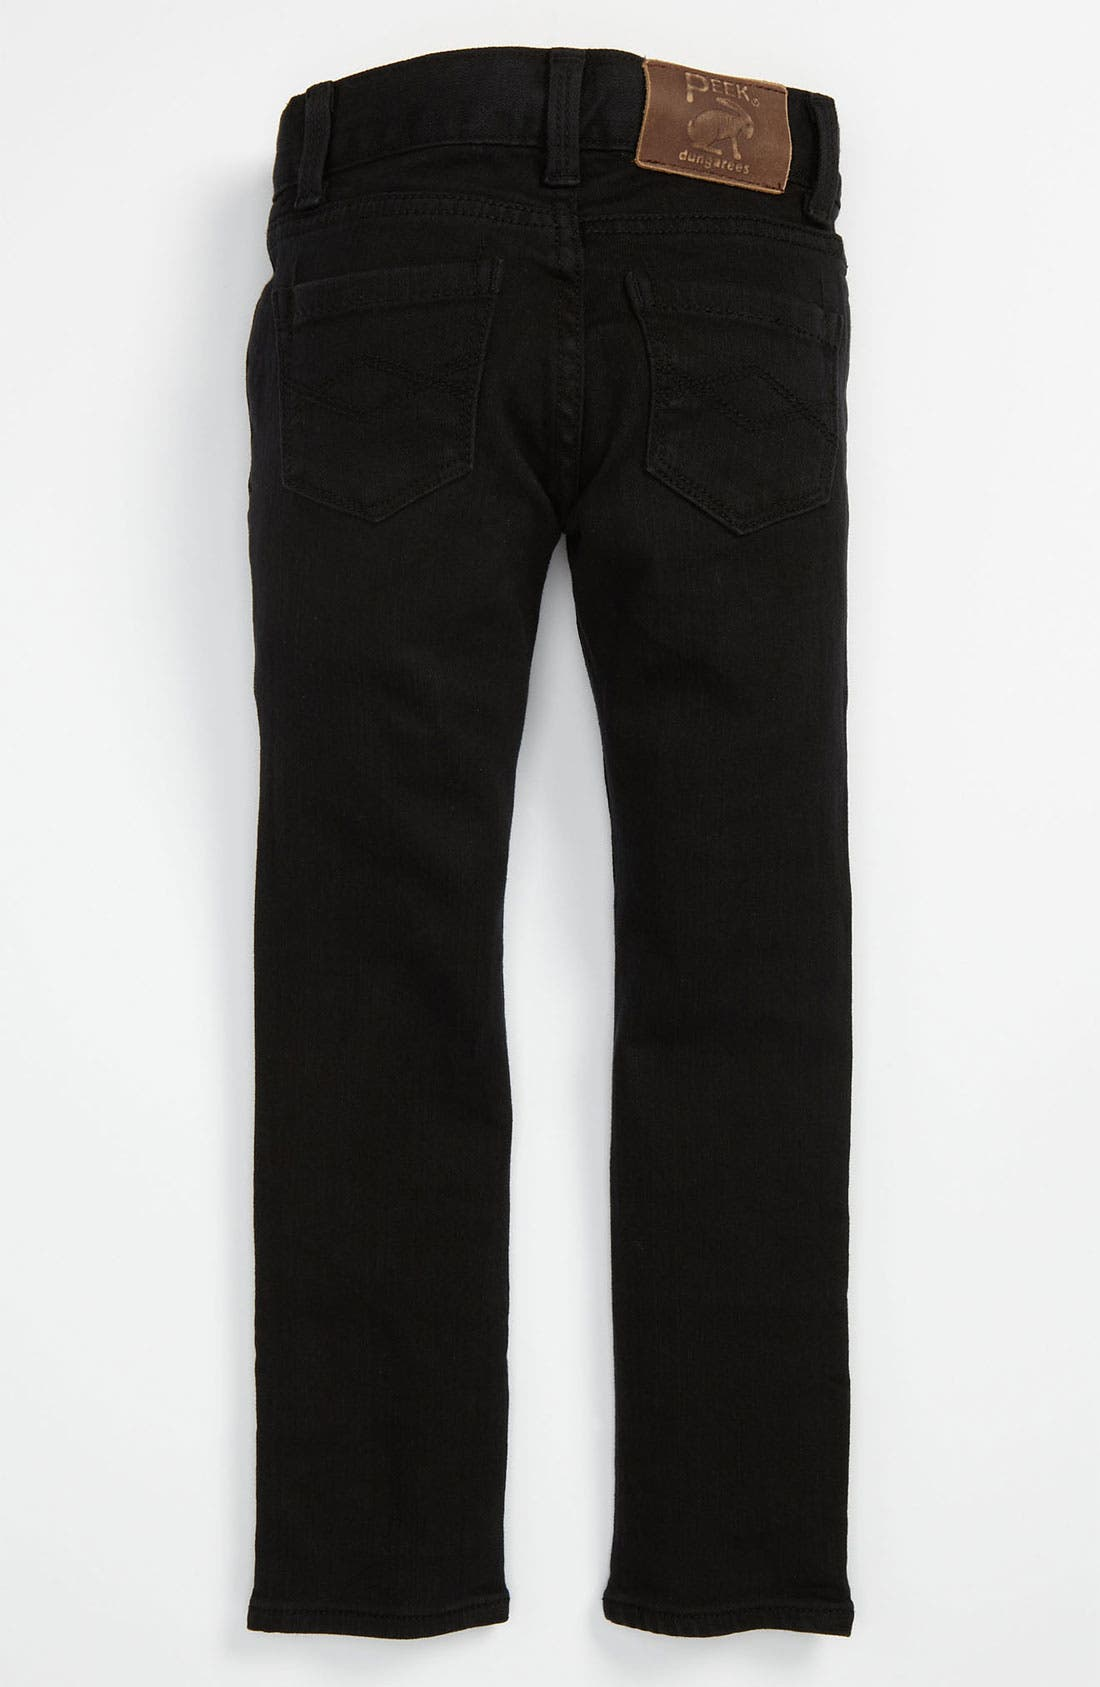 Alternate Image 1 Selected - Peek 'Audrey' Jeans (Toddler, Little Girls & Big Girls)